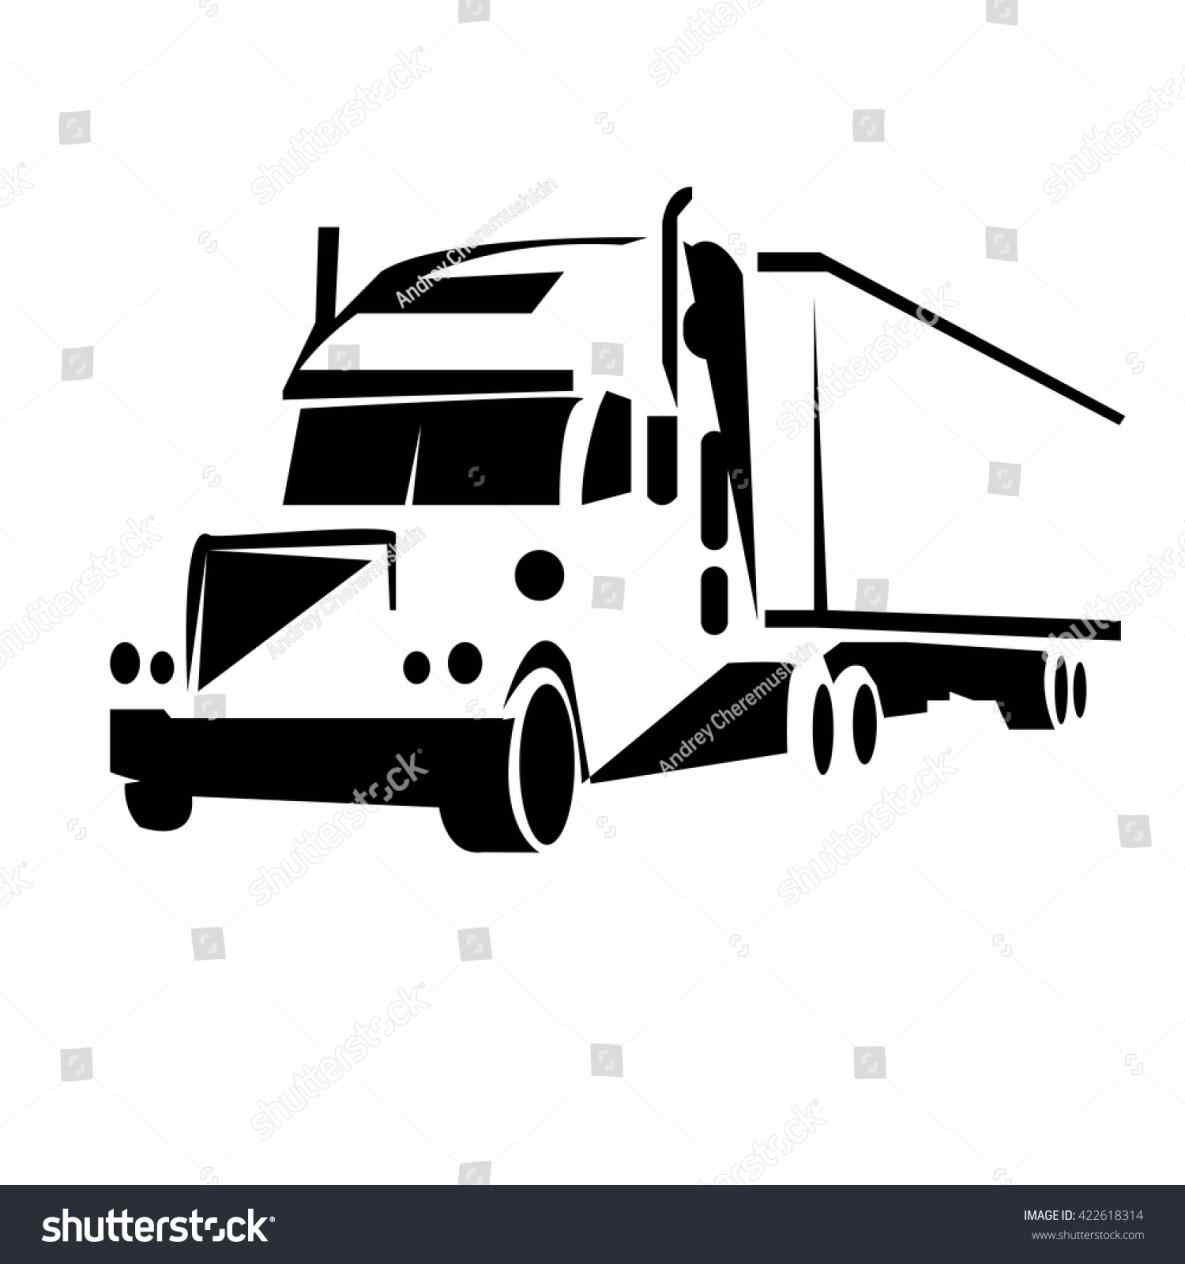 1185x1264 Flat Bed Truck Vector